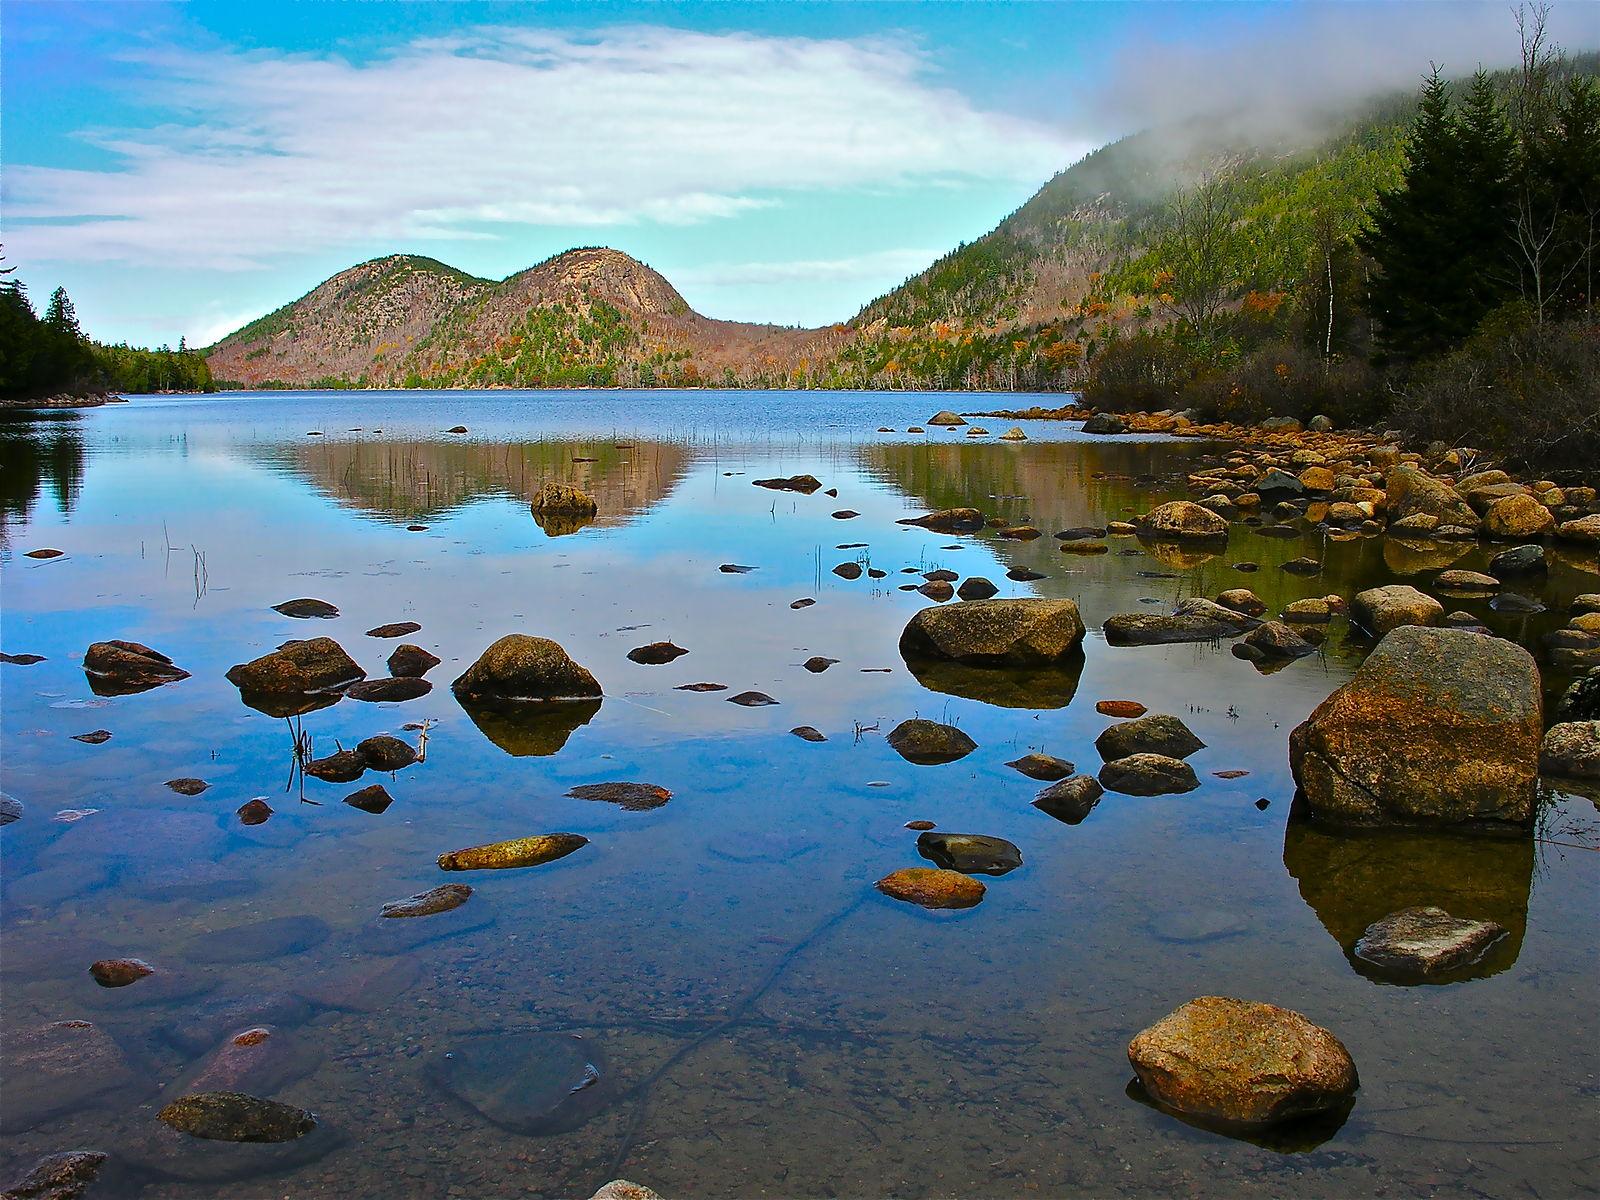 Jordan Pond in Acadia National Park  Photo by Plh1234us/CCA-SA 3.0